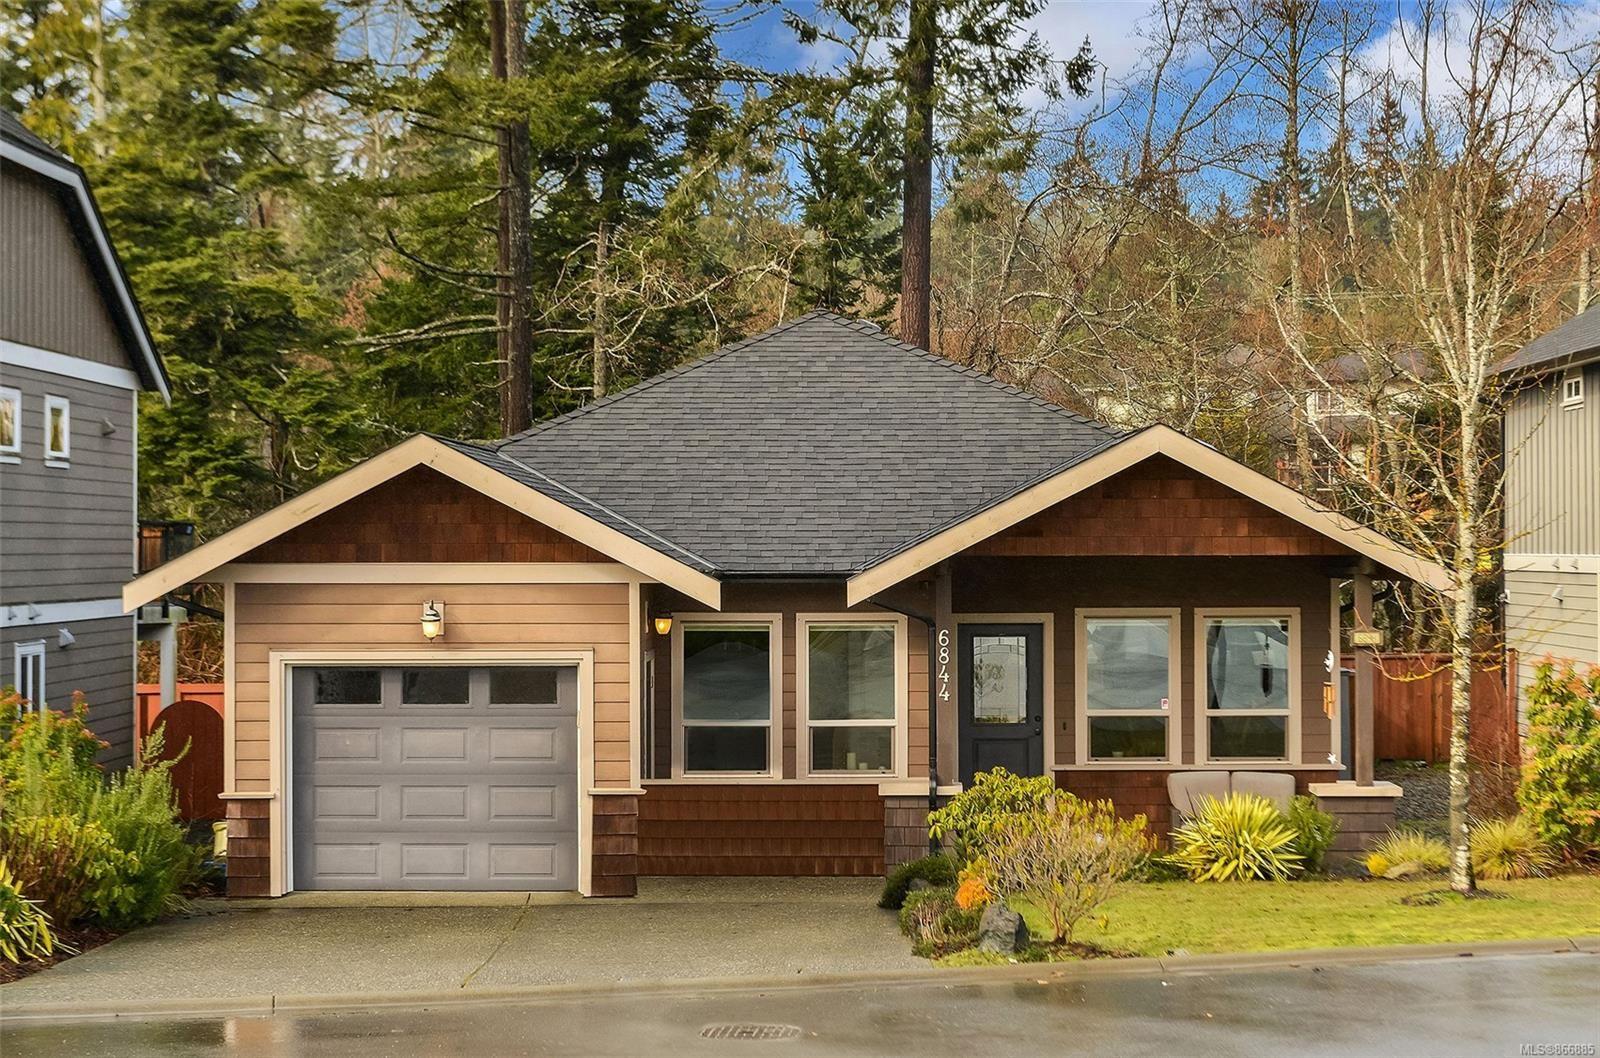 Main Photo: 6844 MARSDEN Rd in Sooke: Sk Broomhill House for sale : MLS®# 866885